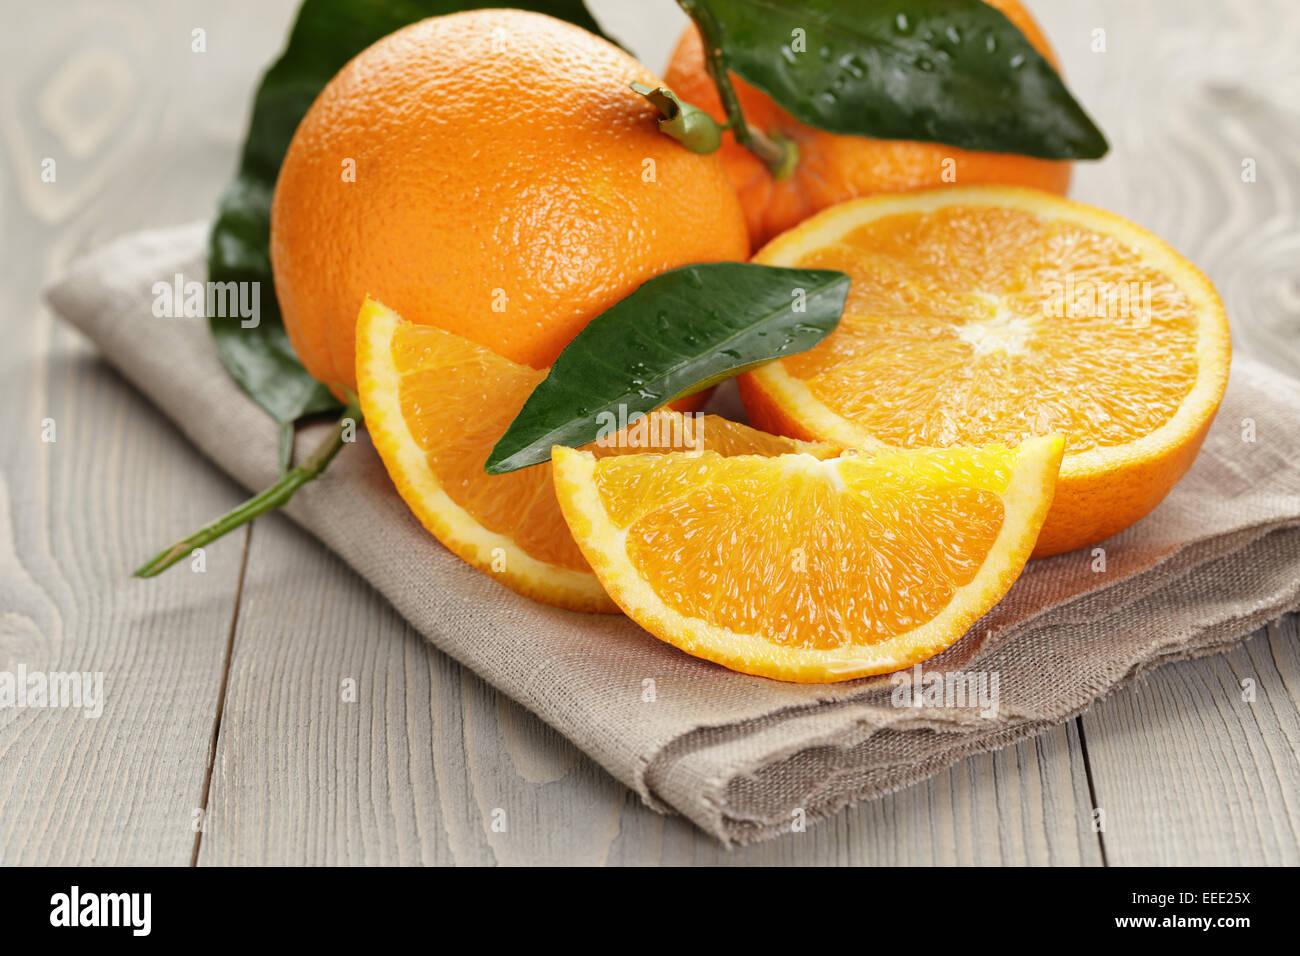 ripe spanish oranges on wood table, rustic photo - Stock Image